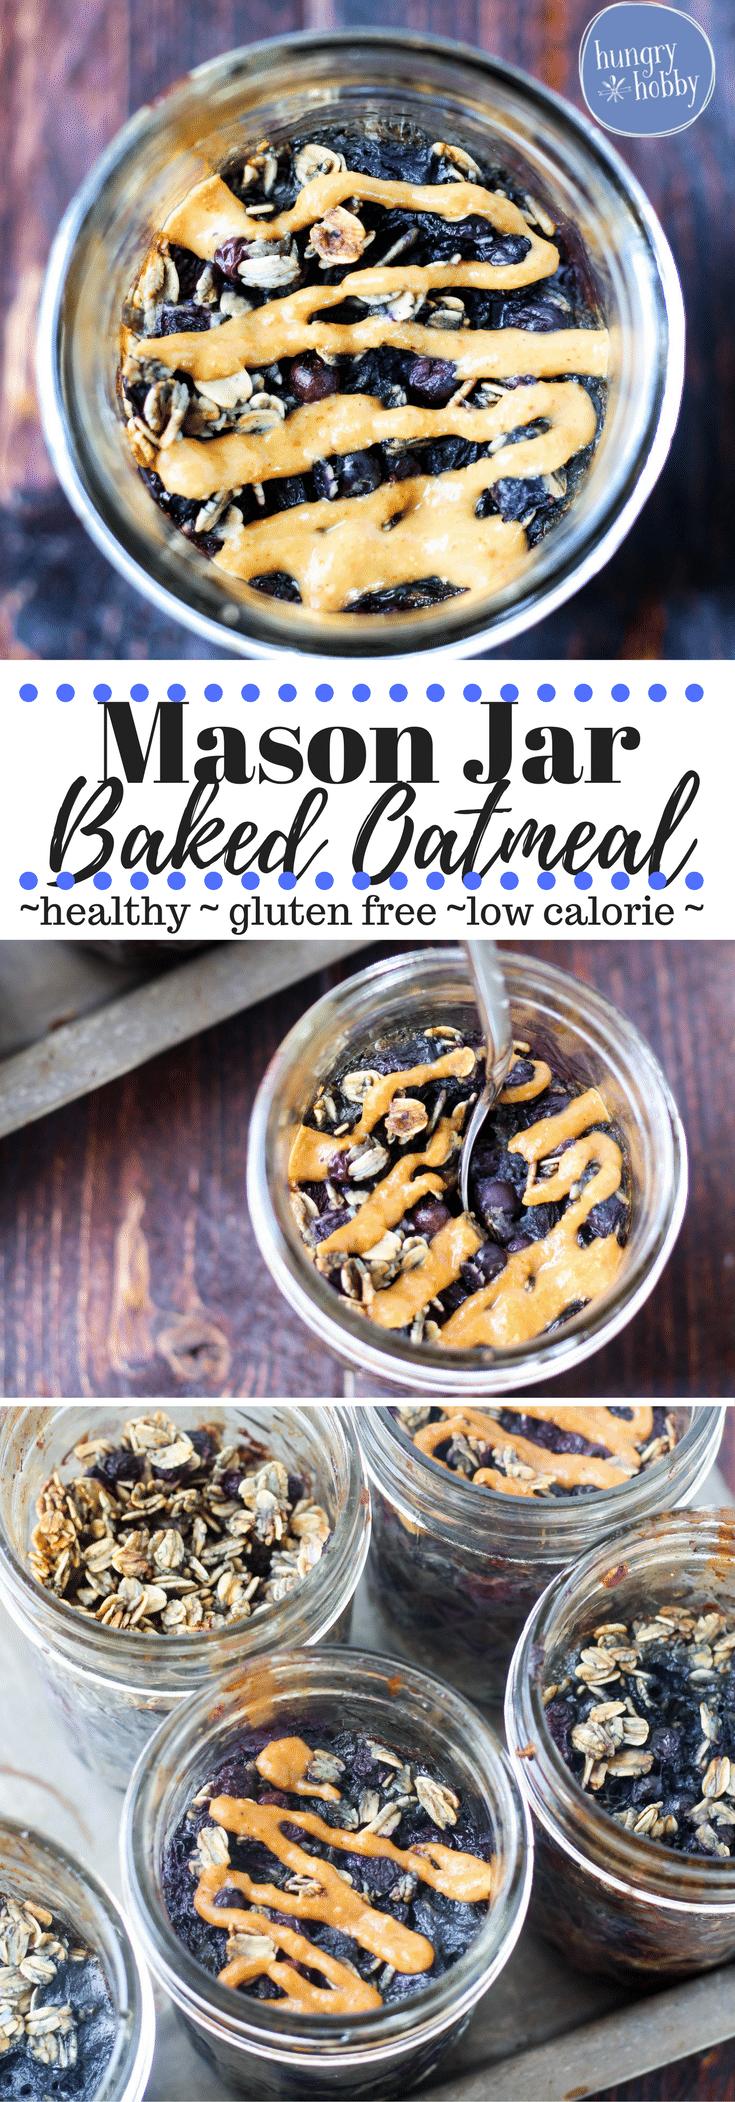 Mason Jar Blueberry Baked Oatmeal Gluten Free Healthy Vegan Option